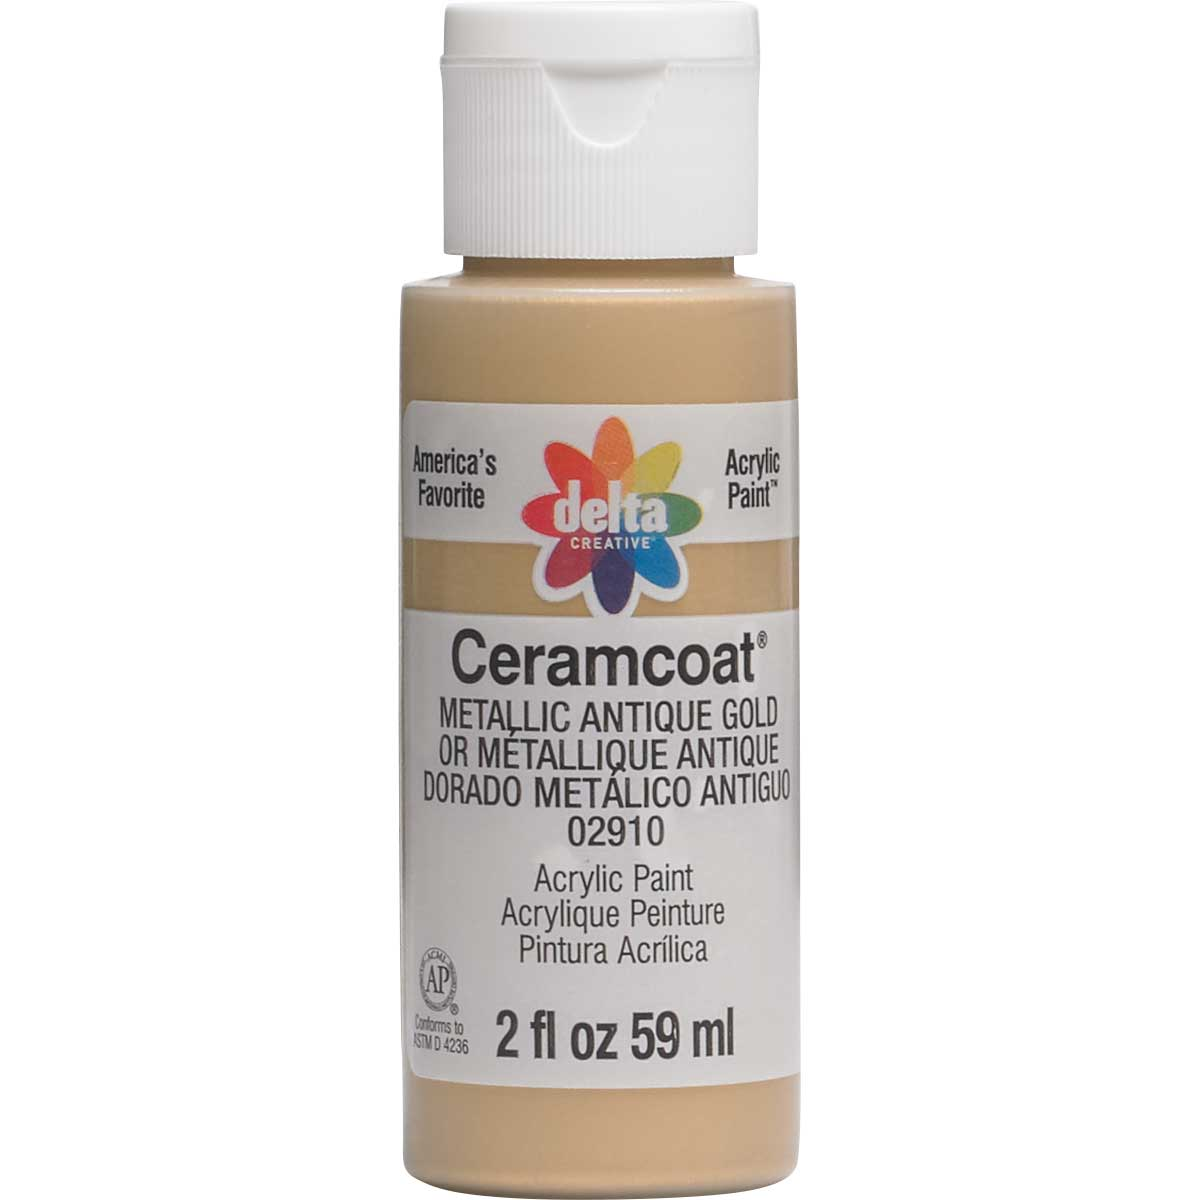 Delta Ceramcoat ® Acrylic Paint - Metallic Antique Gold, 2 oz.